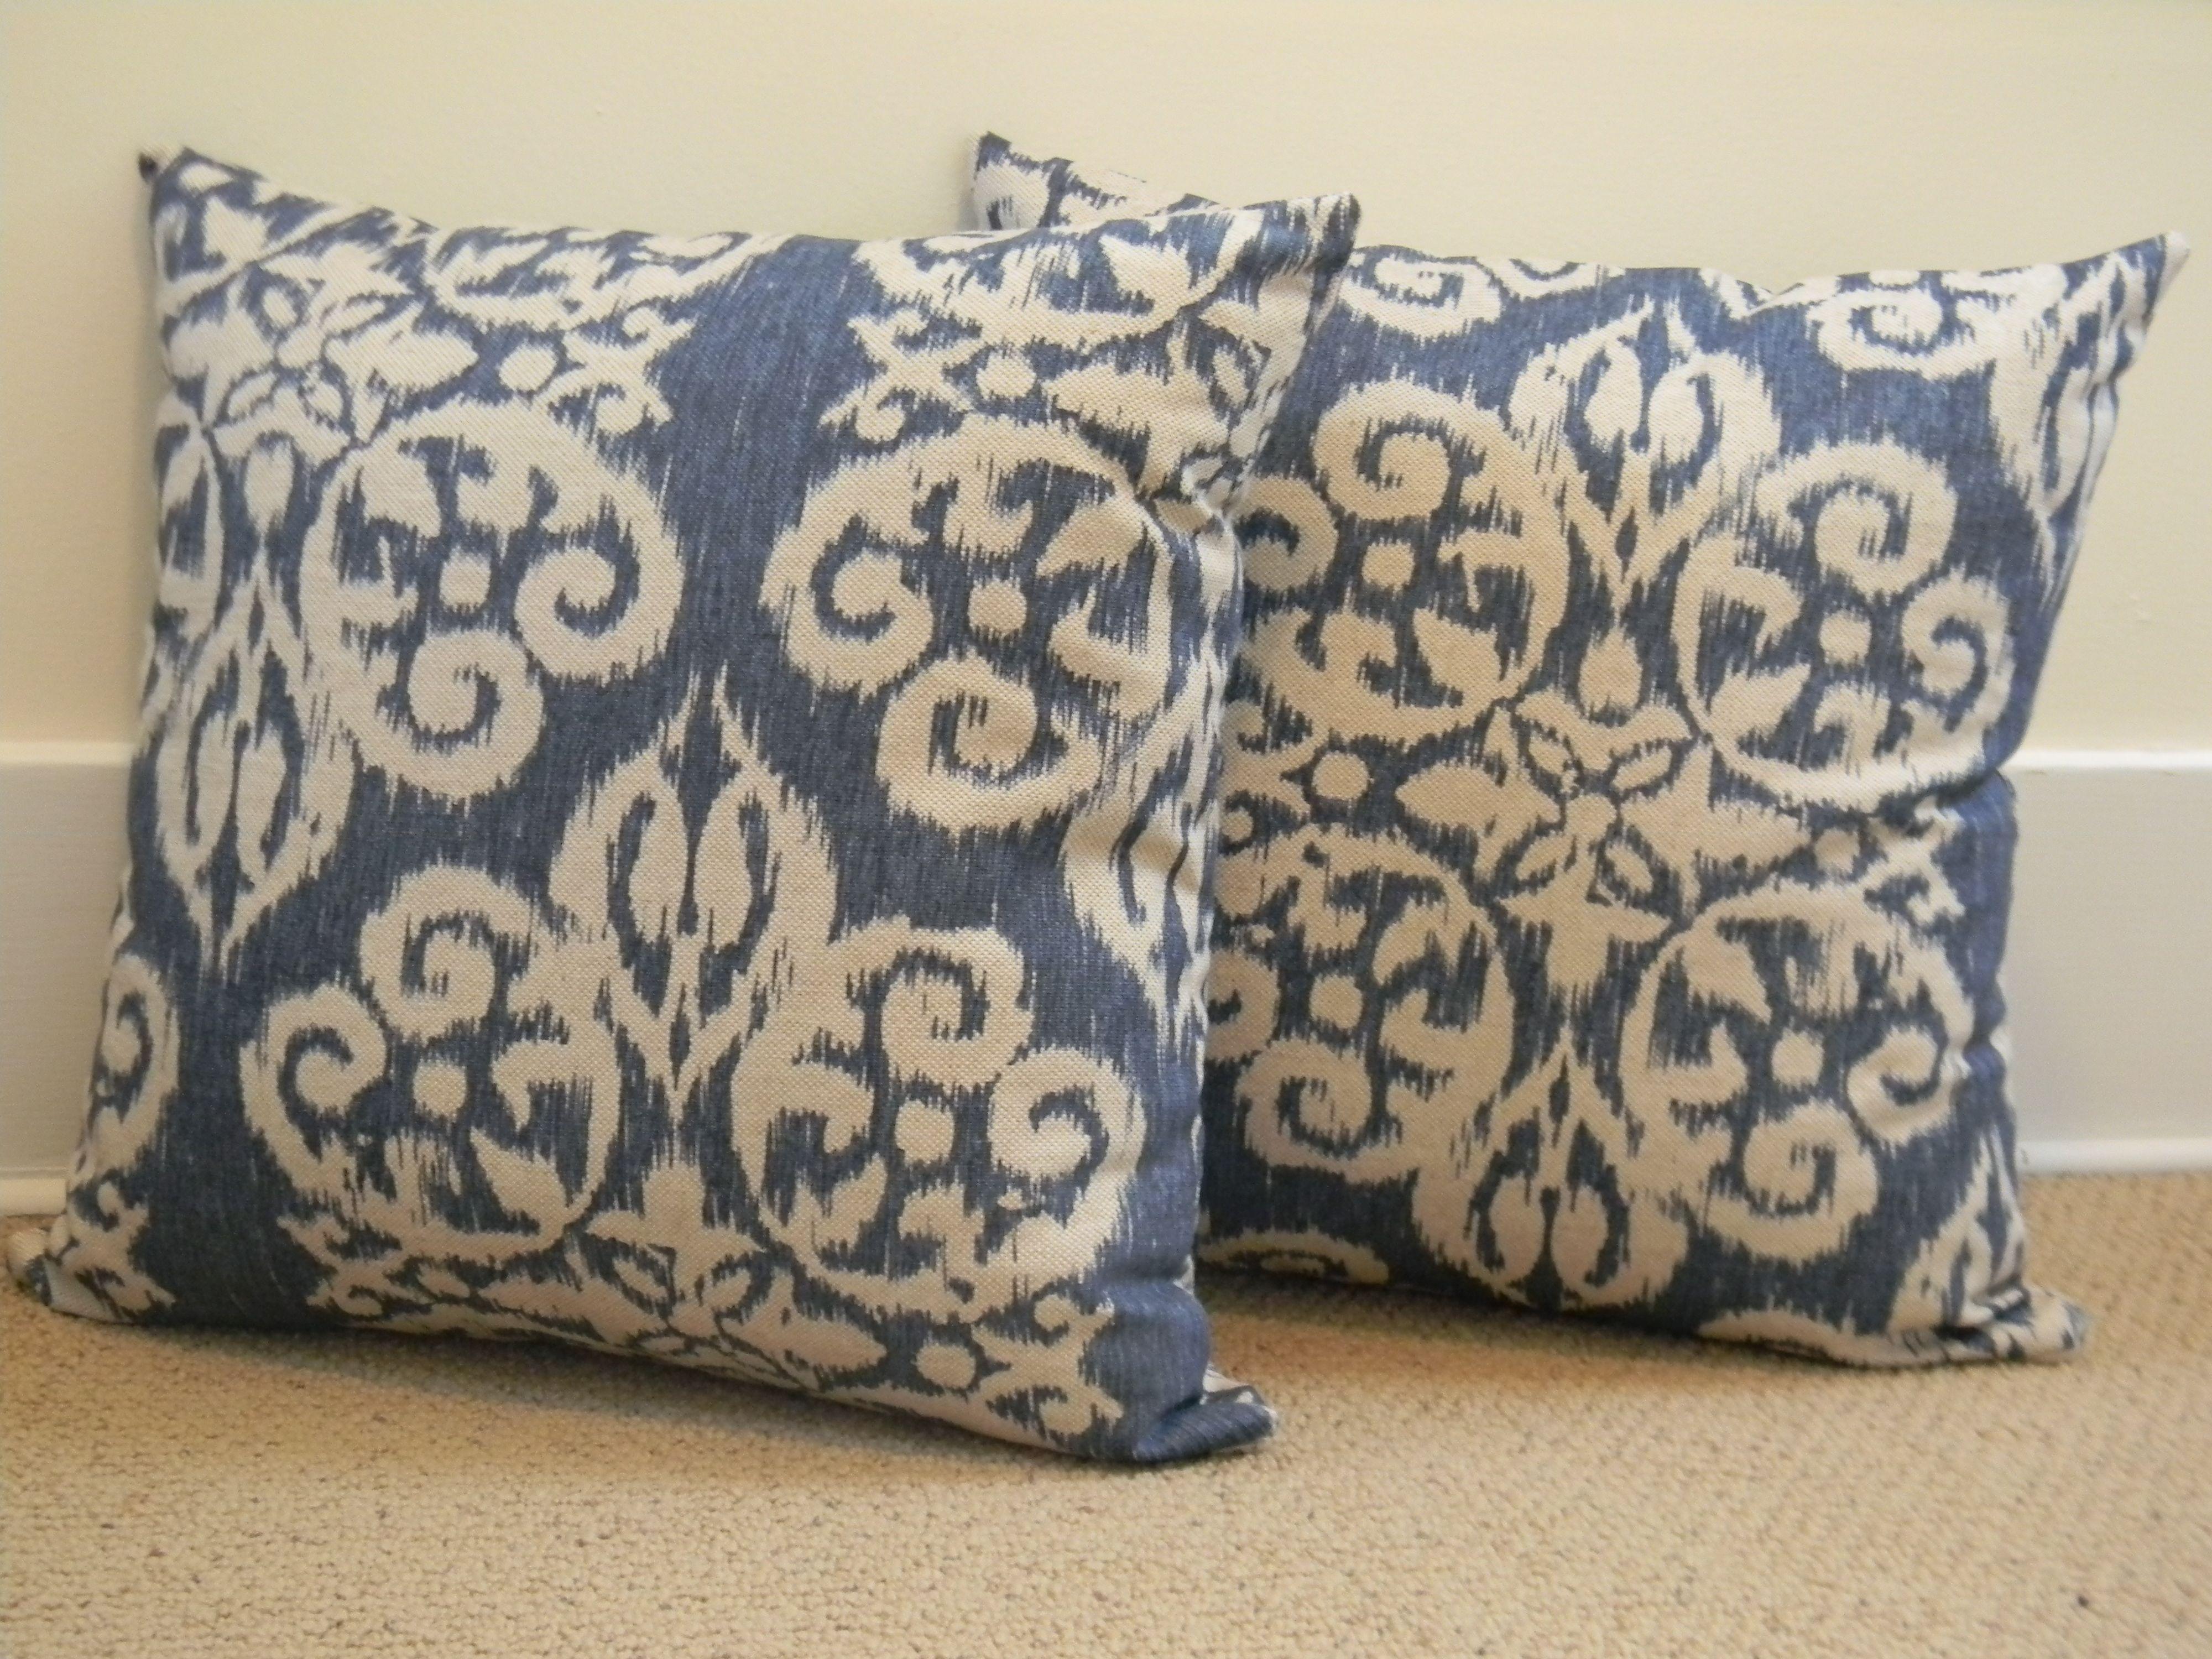 Handmade Bella Ikat Indigo Blue Pillow Covers  http://www.etsy.com/shop/PopOfColorPillows